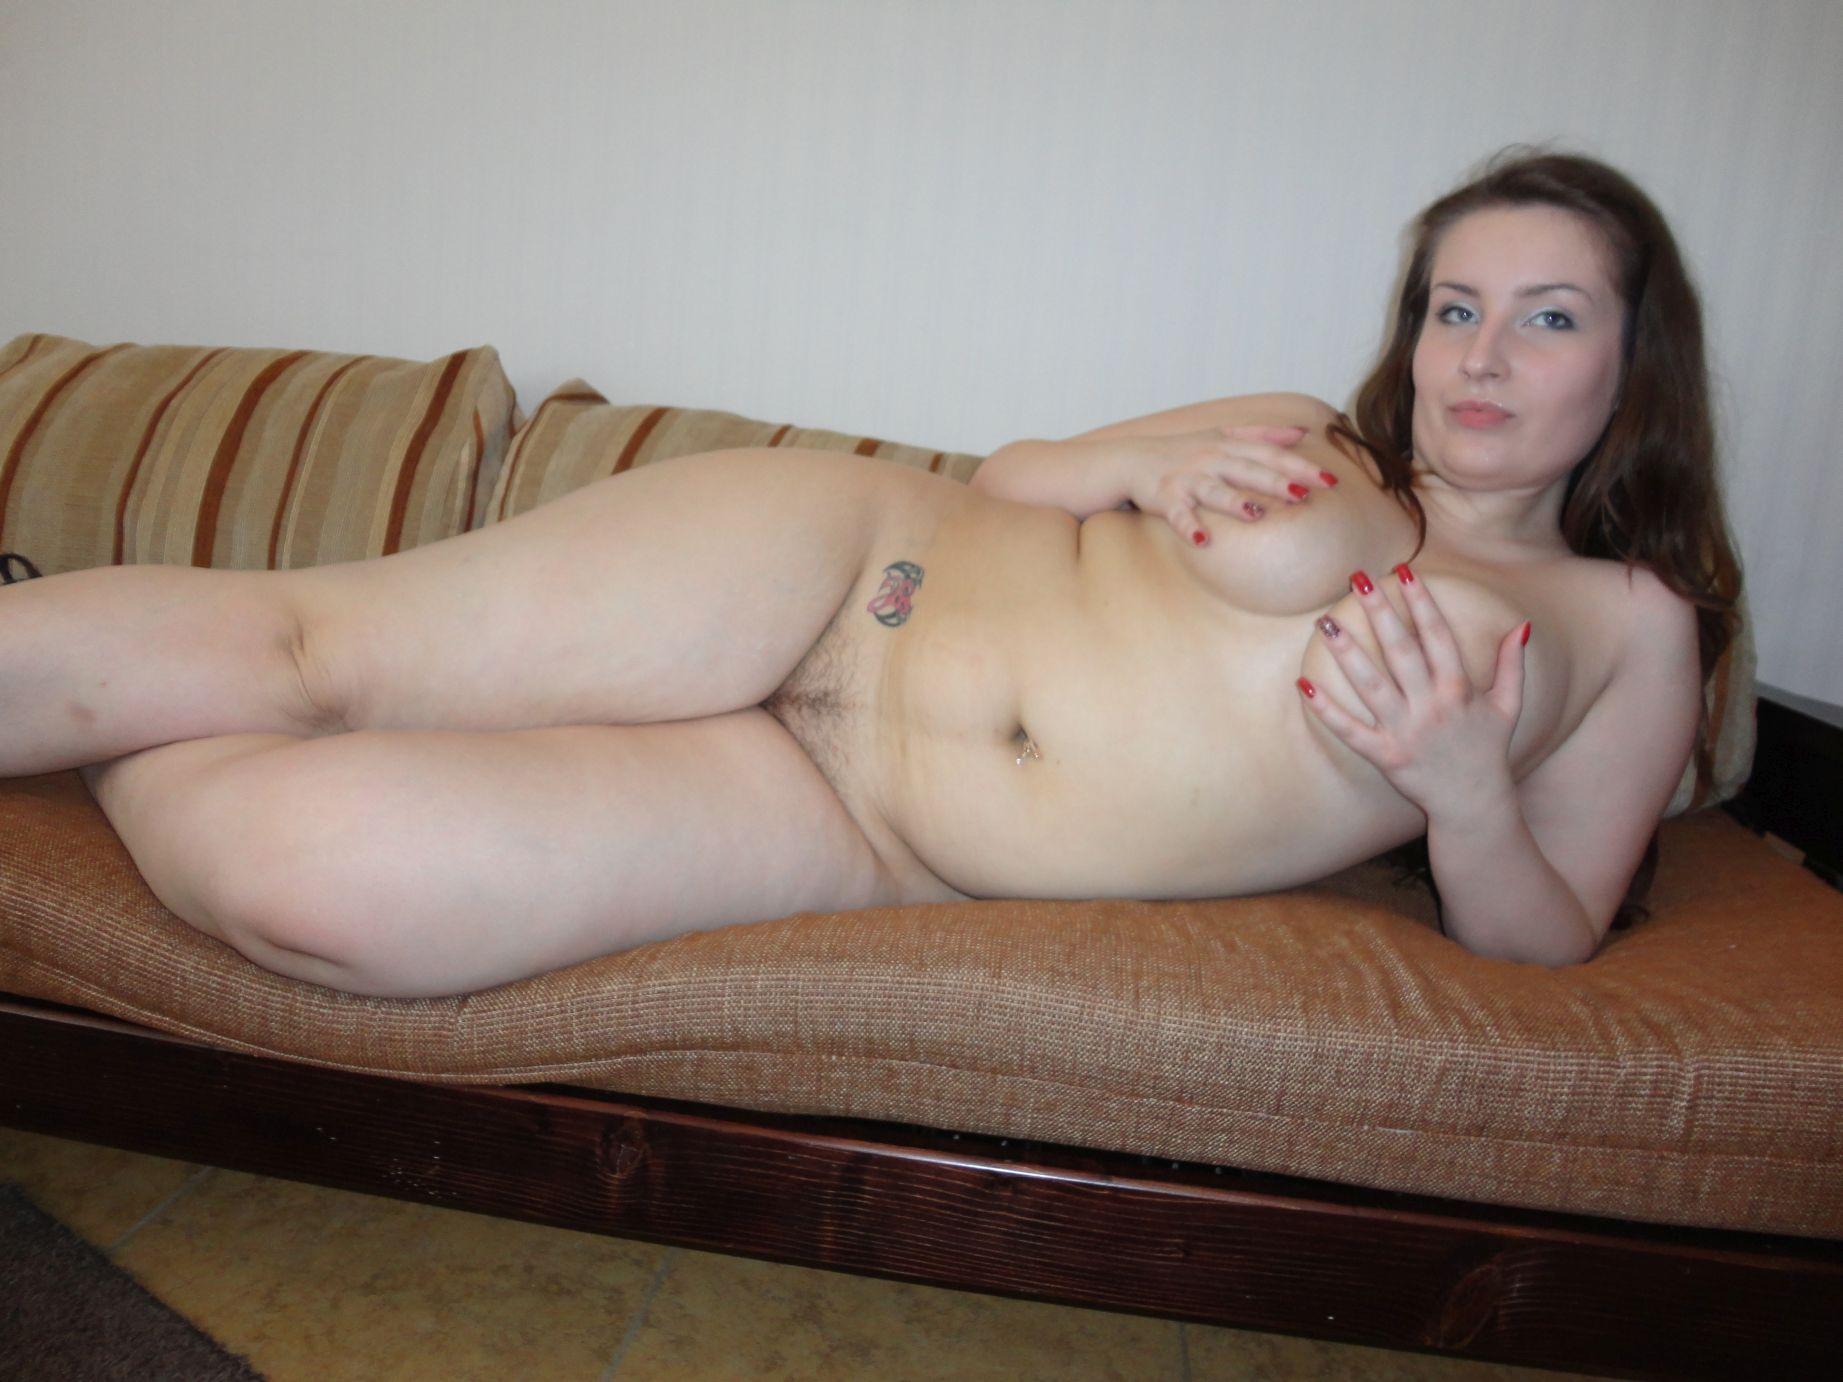 Nackte vollschlanke Frau